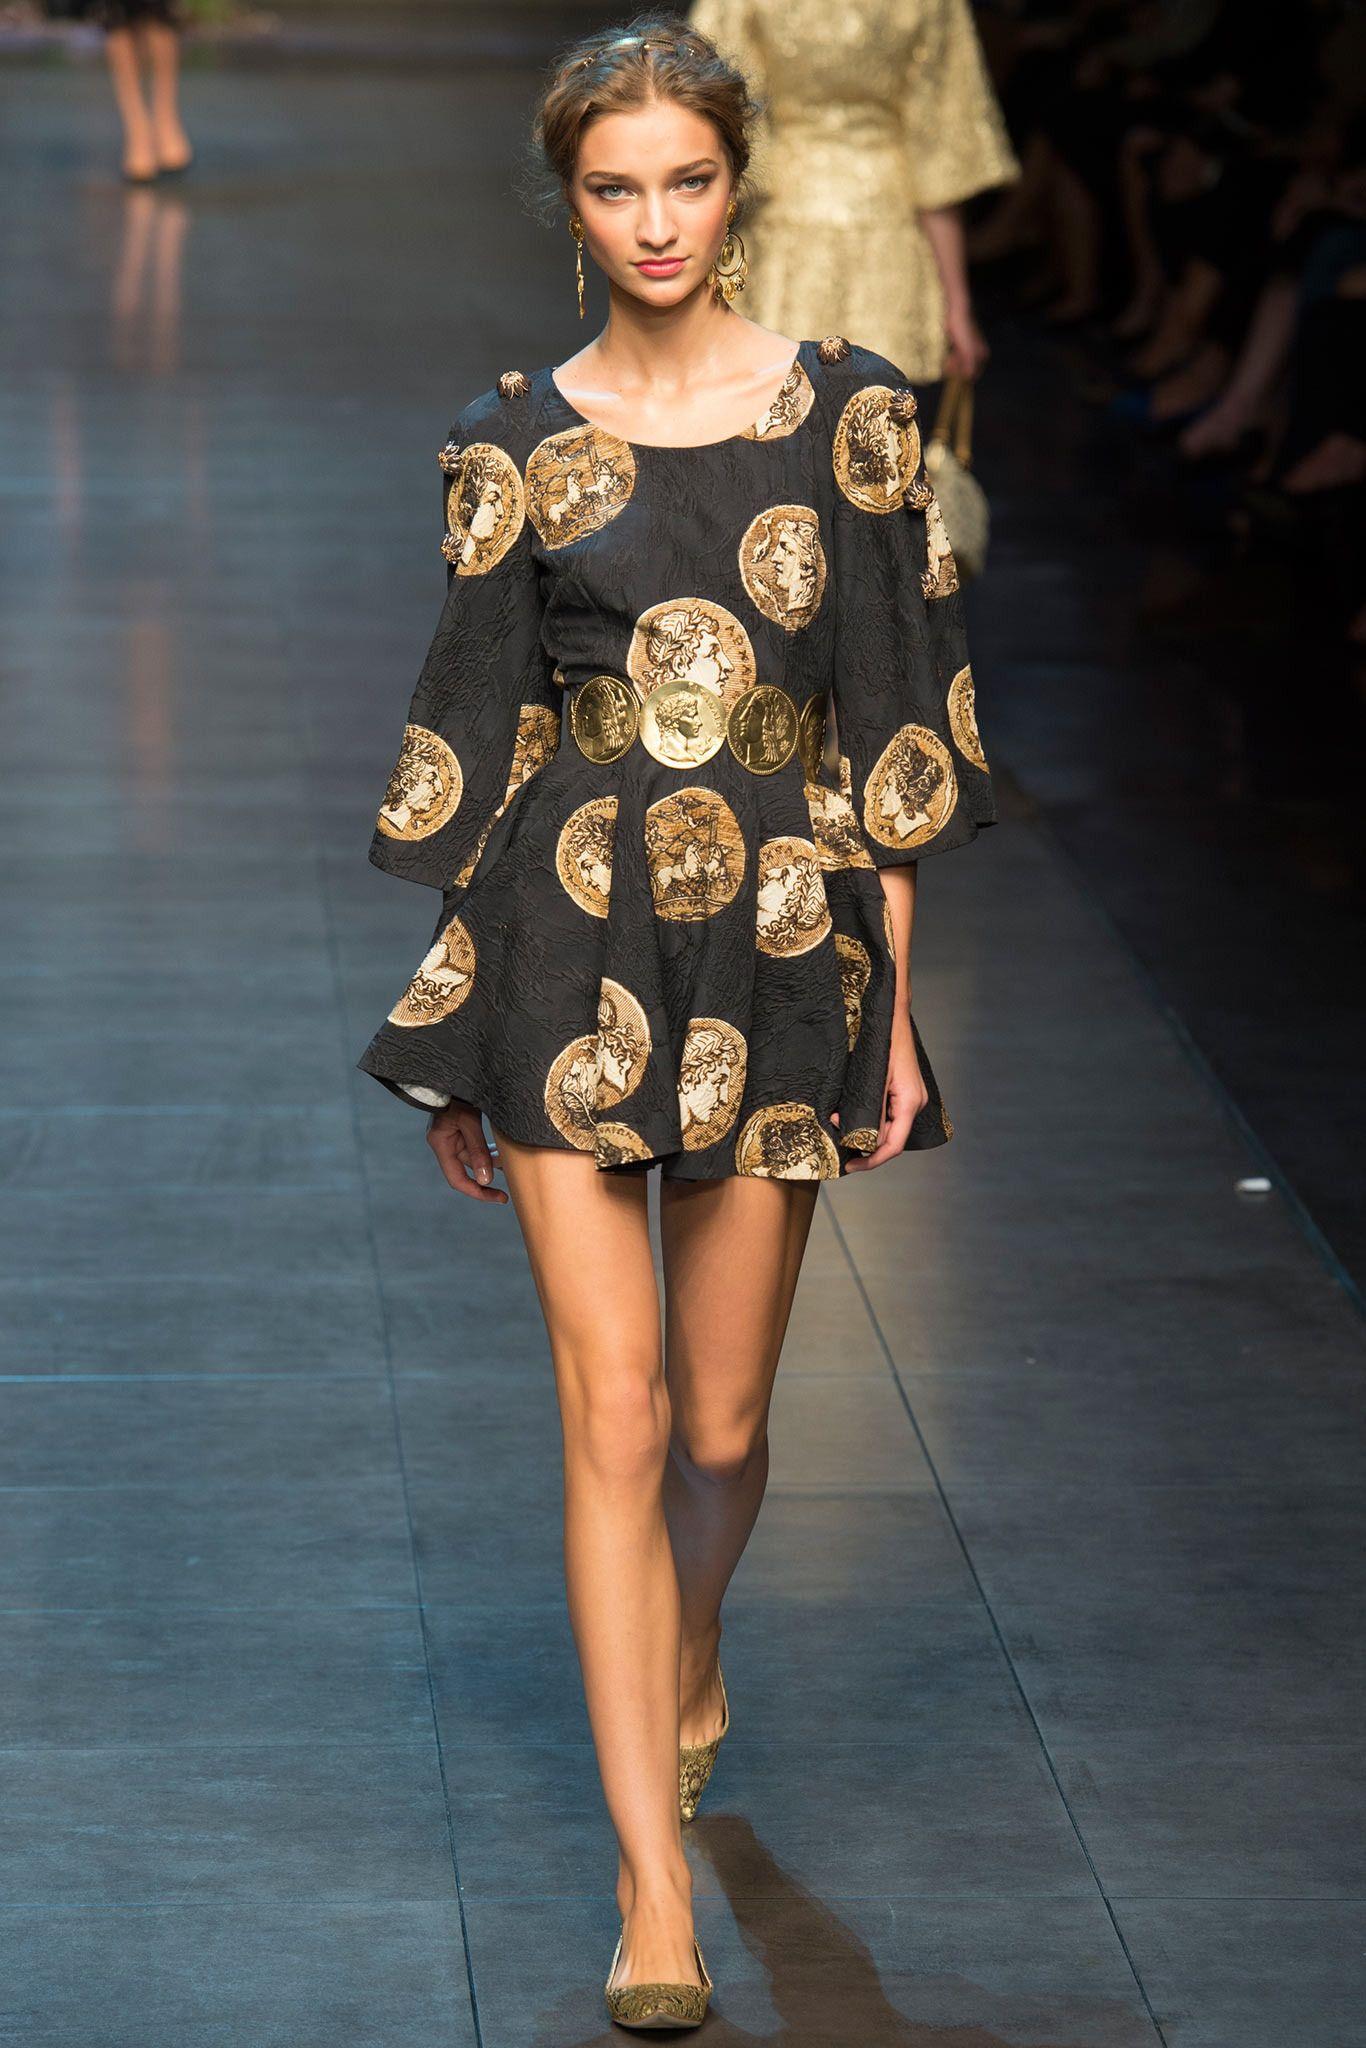 Anastasija Titko - Dolce & Gabbana Spring 2014 Ready-to-Wear Collection Slideshow on Style.com